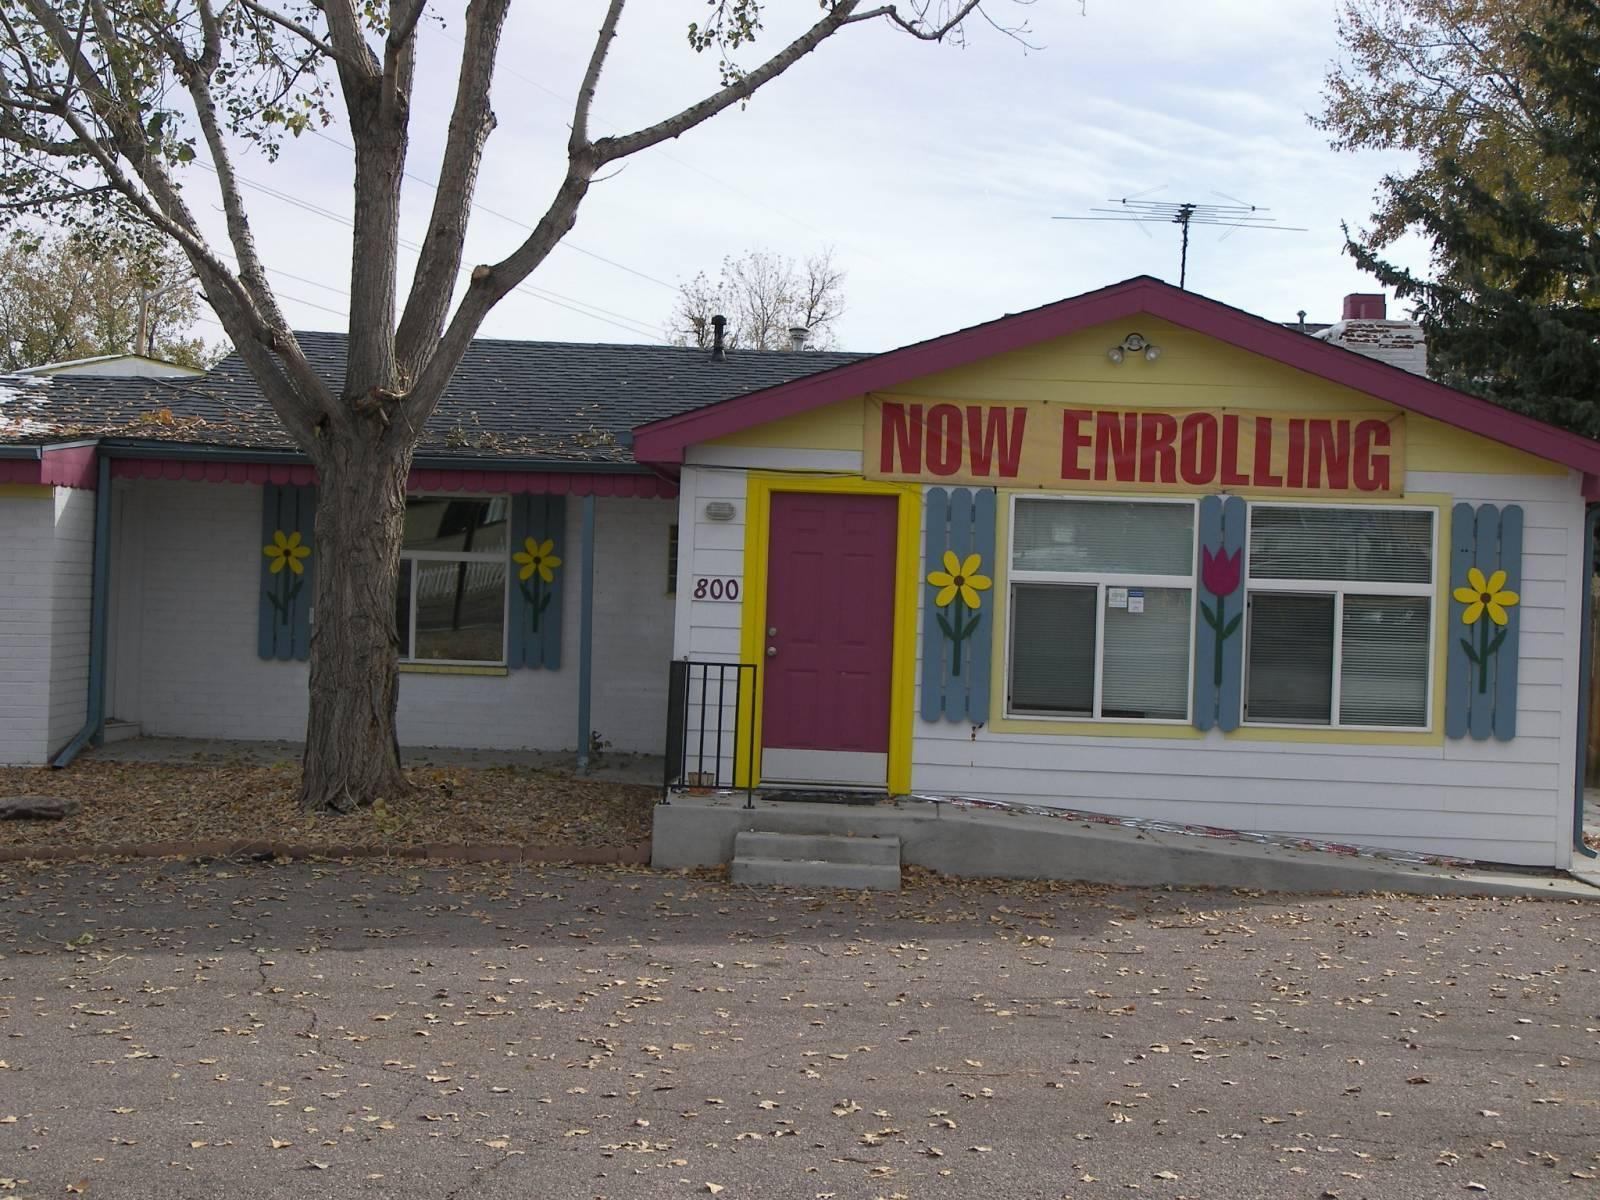 Tiny Town Academy Preschool